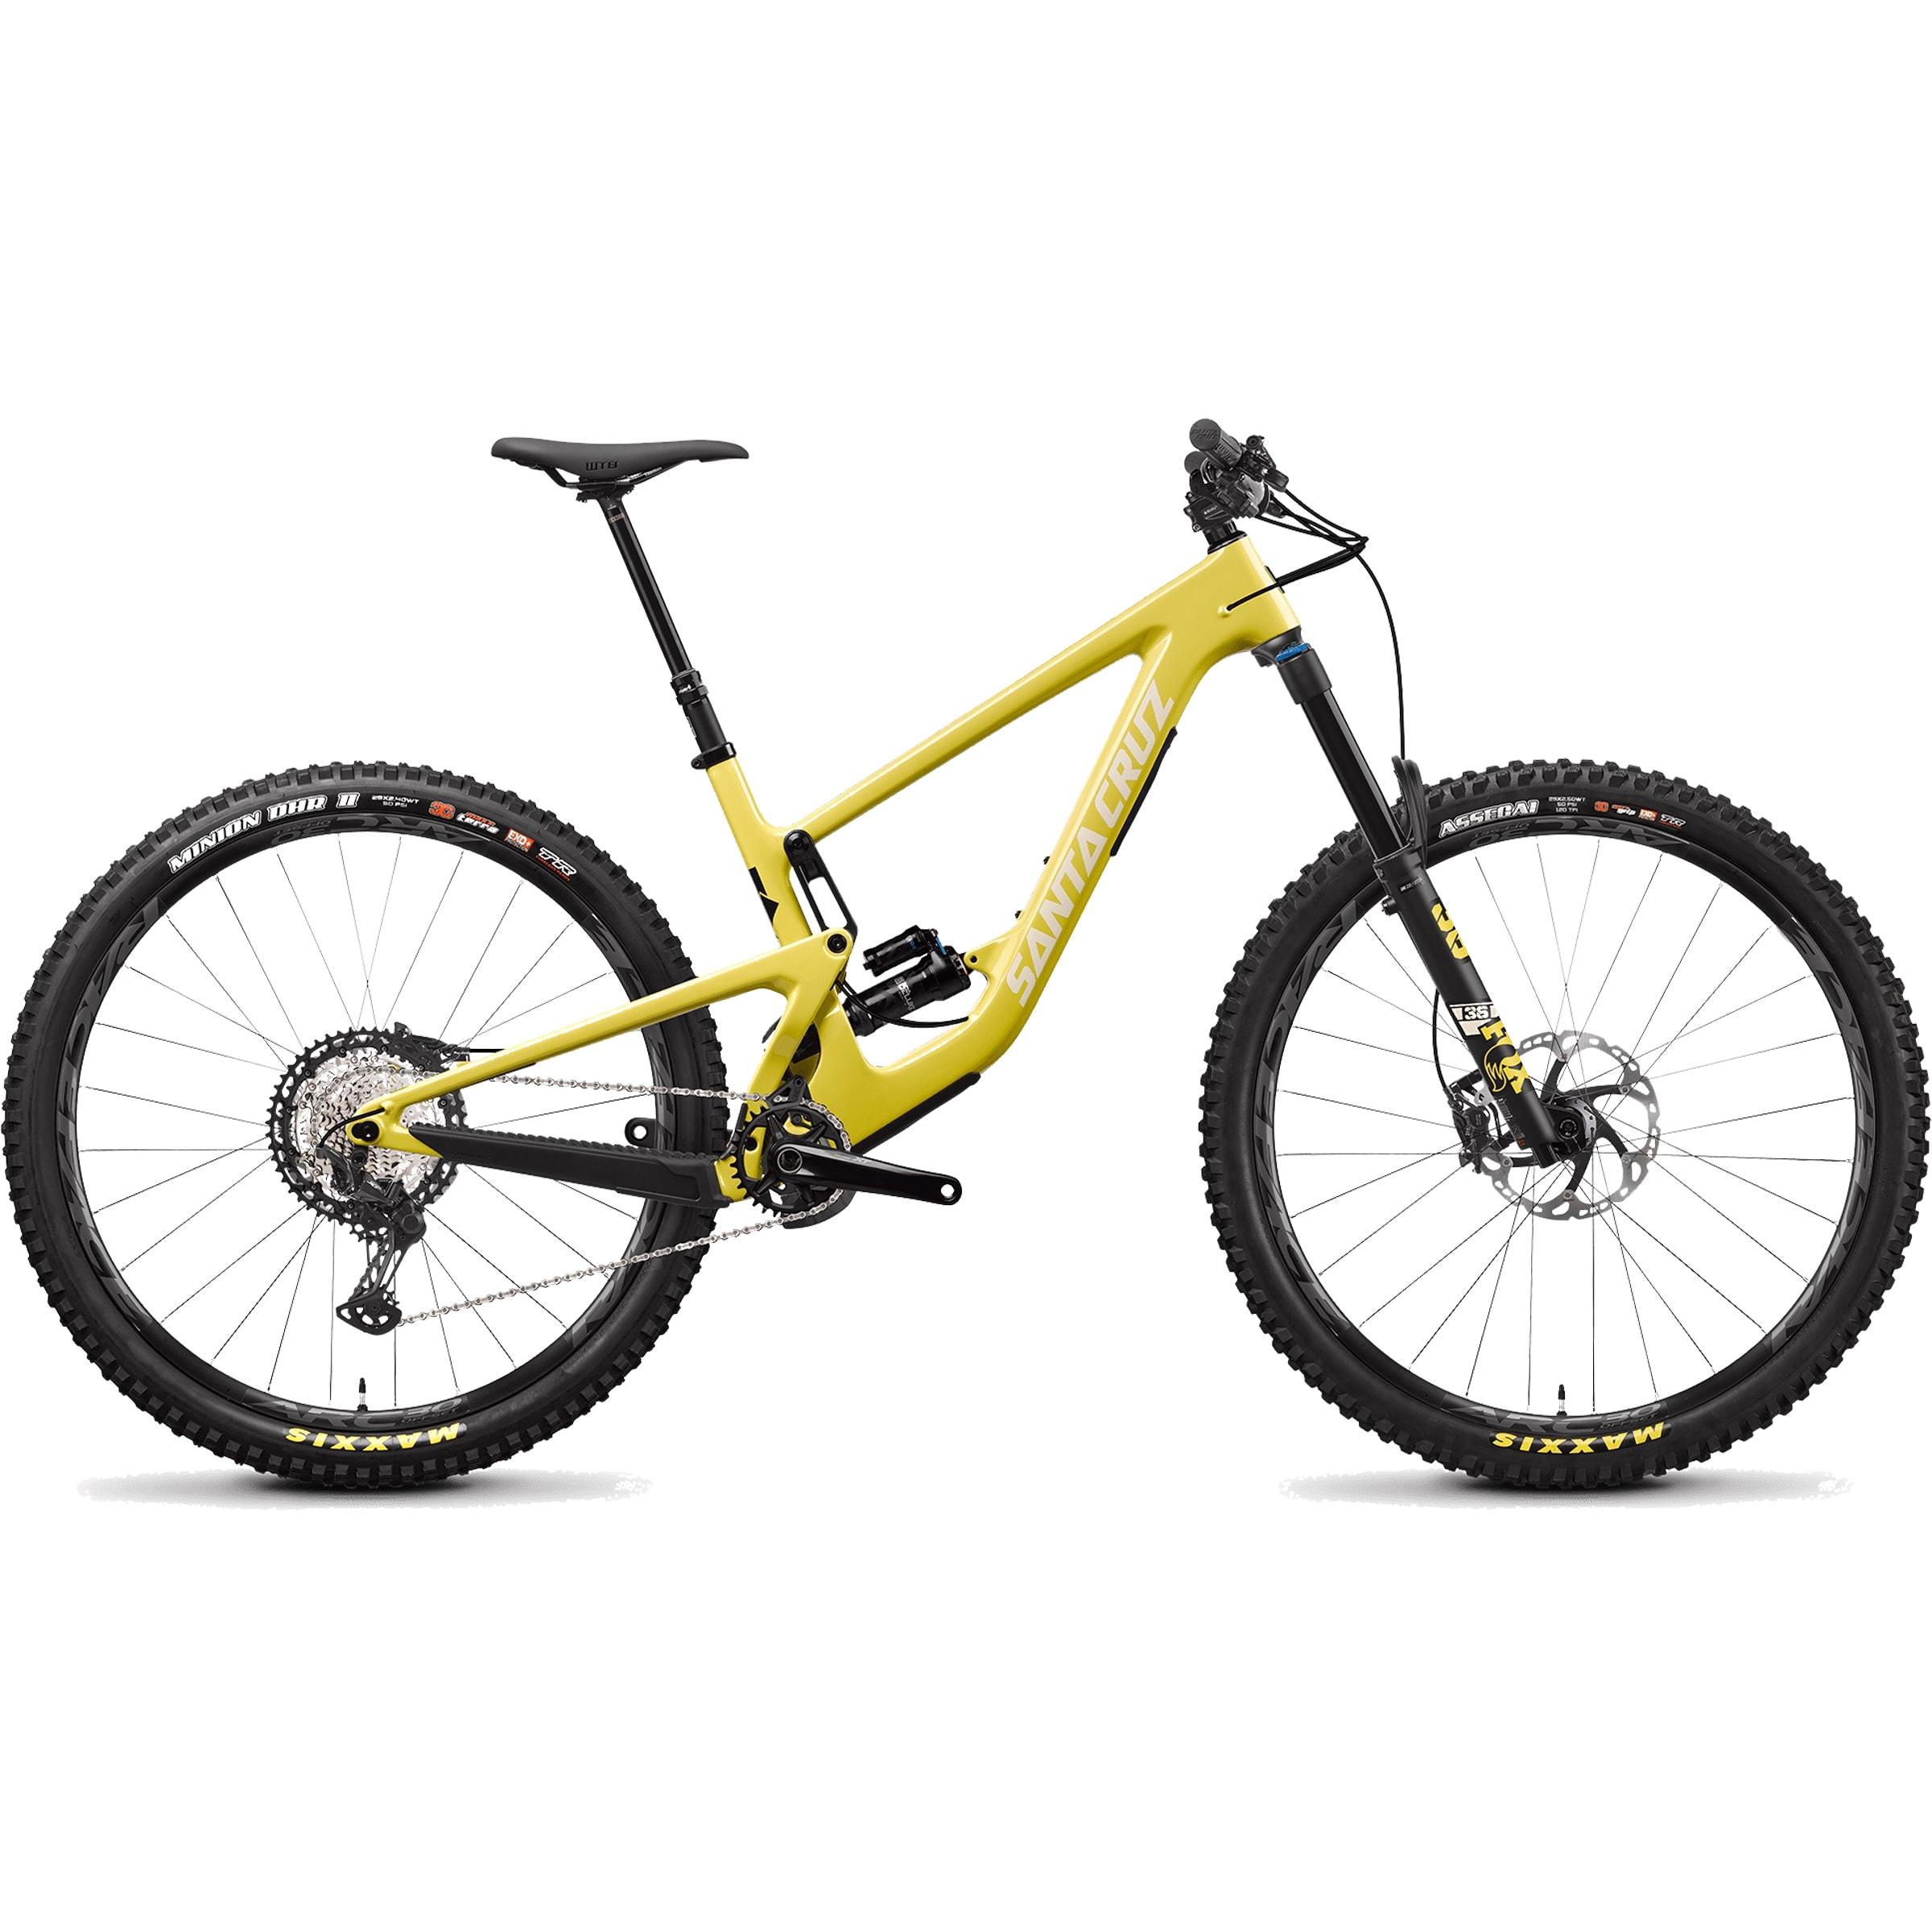 Image of Santa cruz Megatower C XT 29er Mountain Bike 2022 Amarillo Yellow